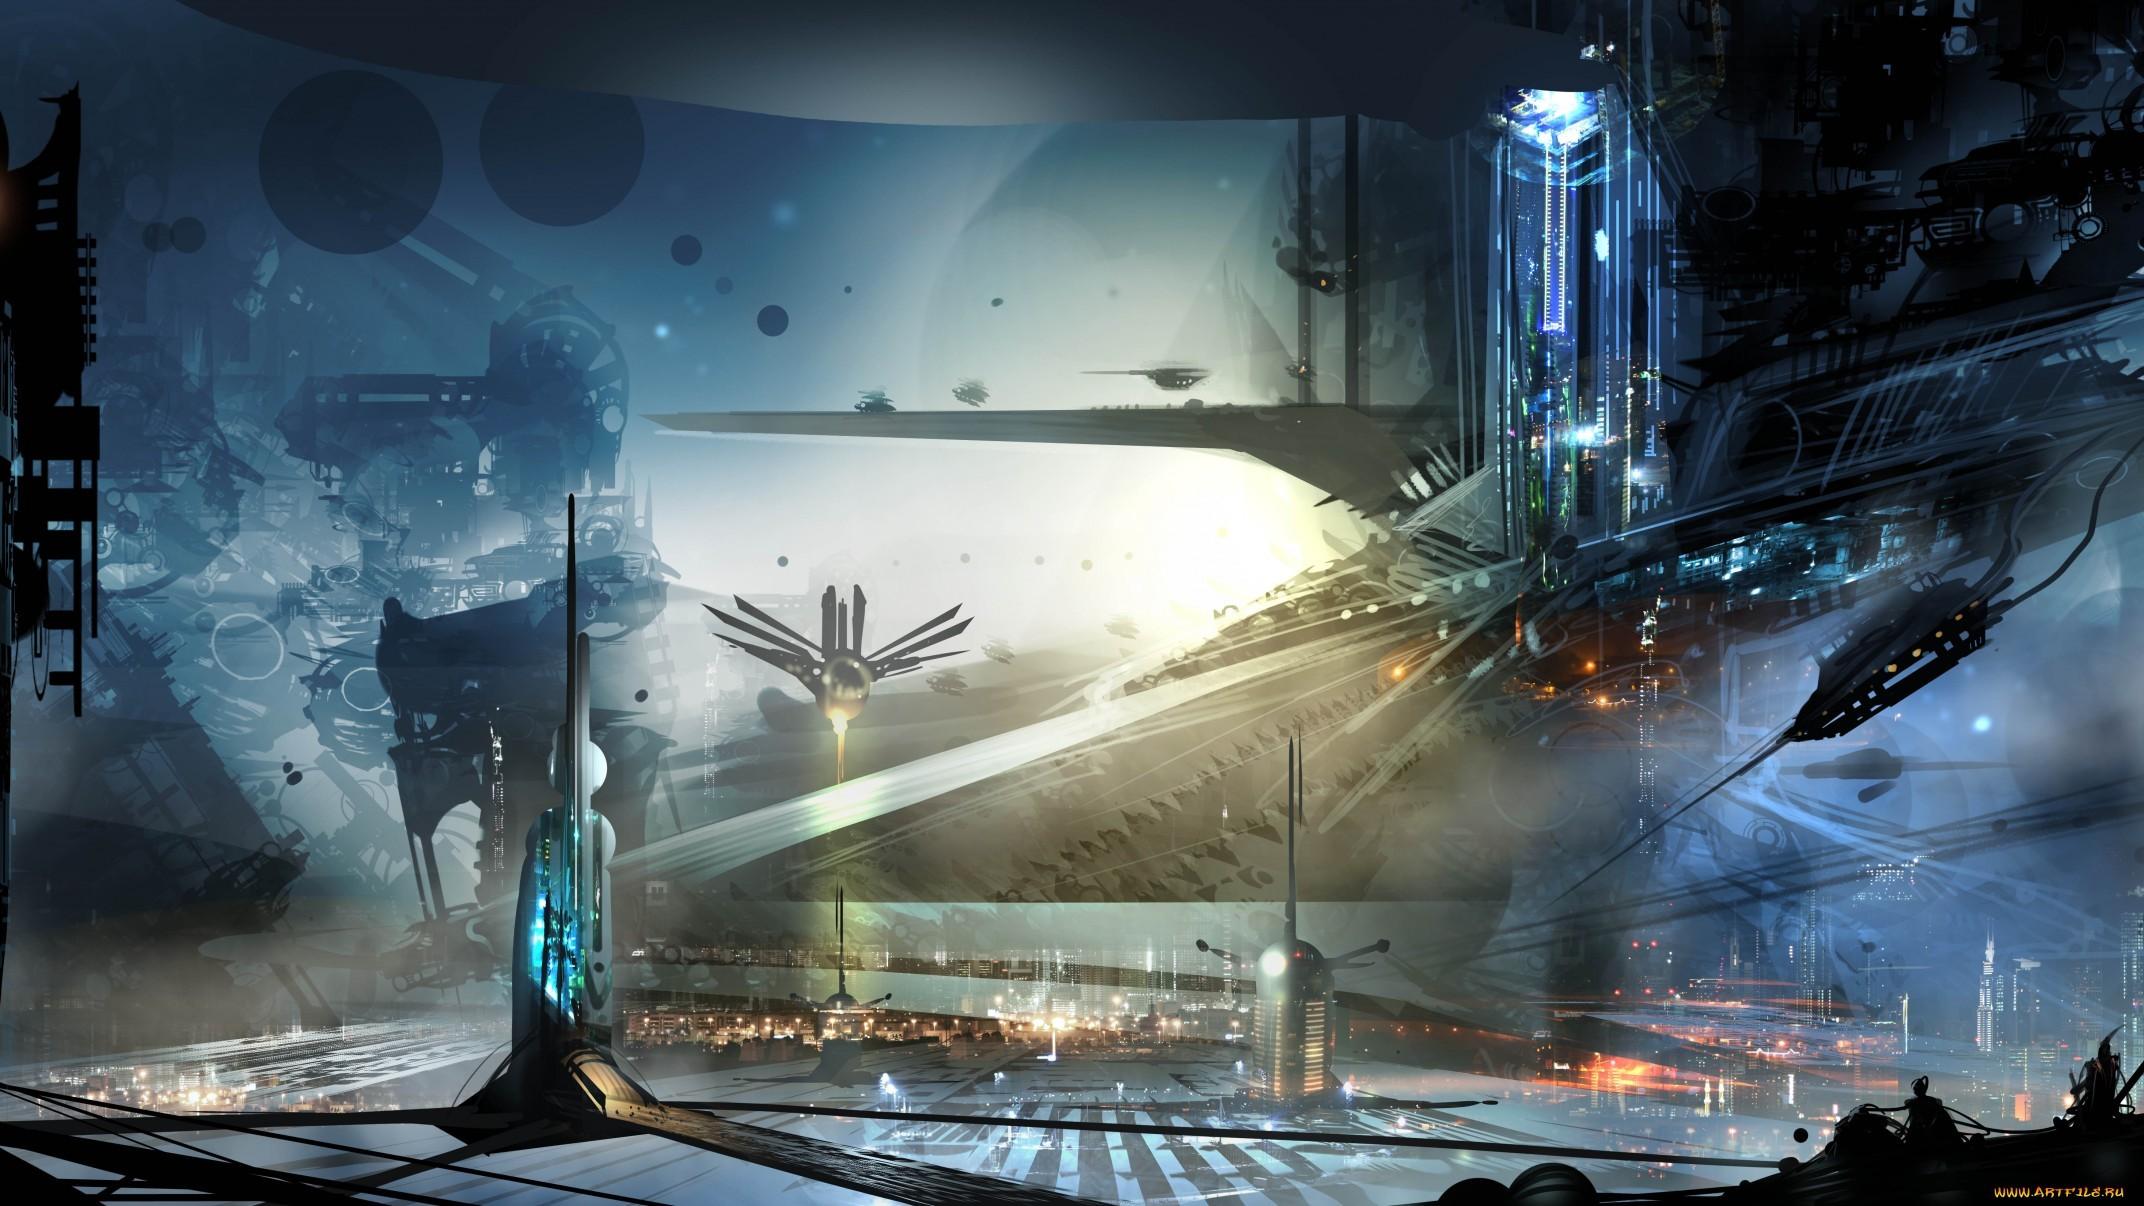 Gorgeous sci-fi artwork by Alex Ruiz.